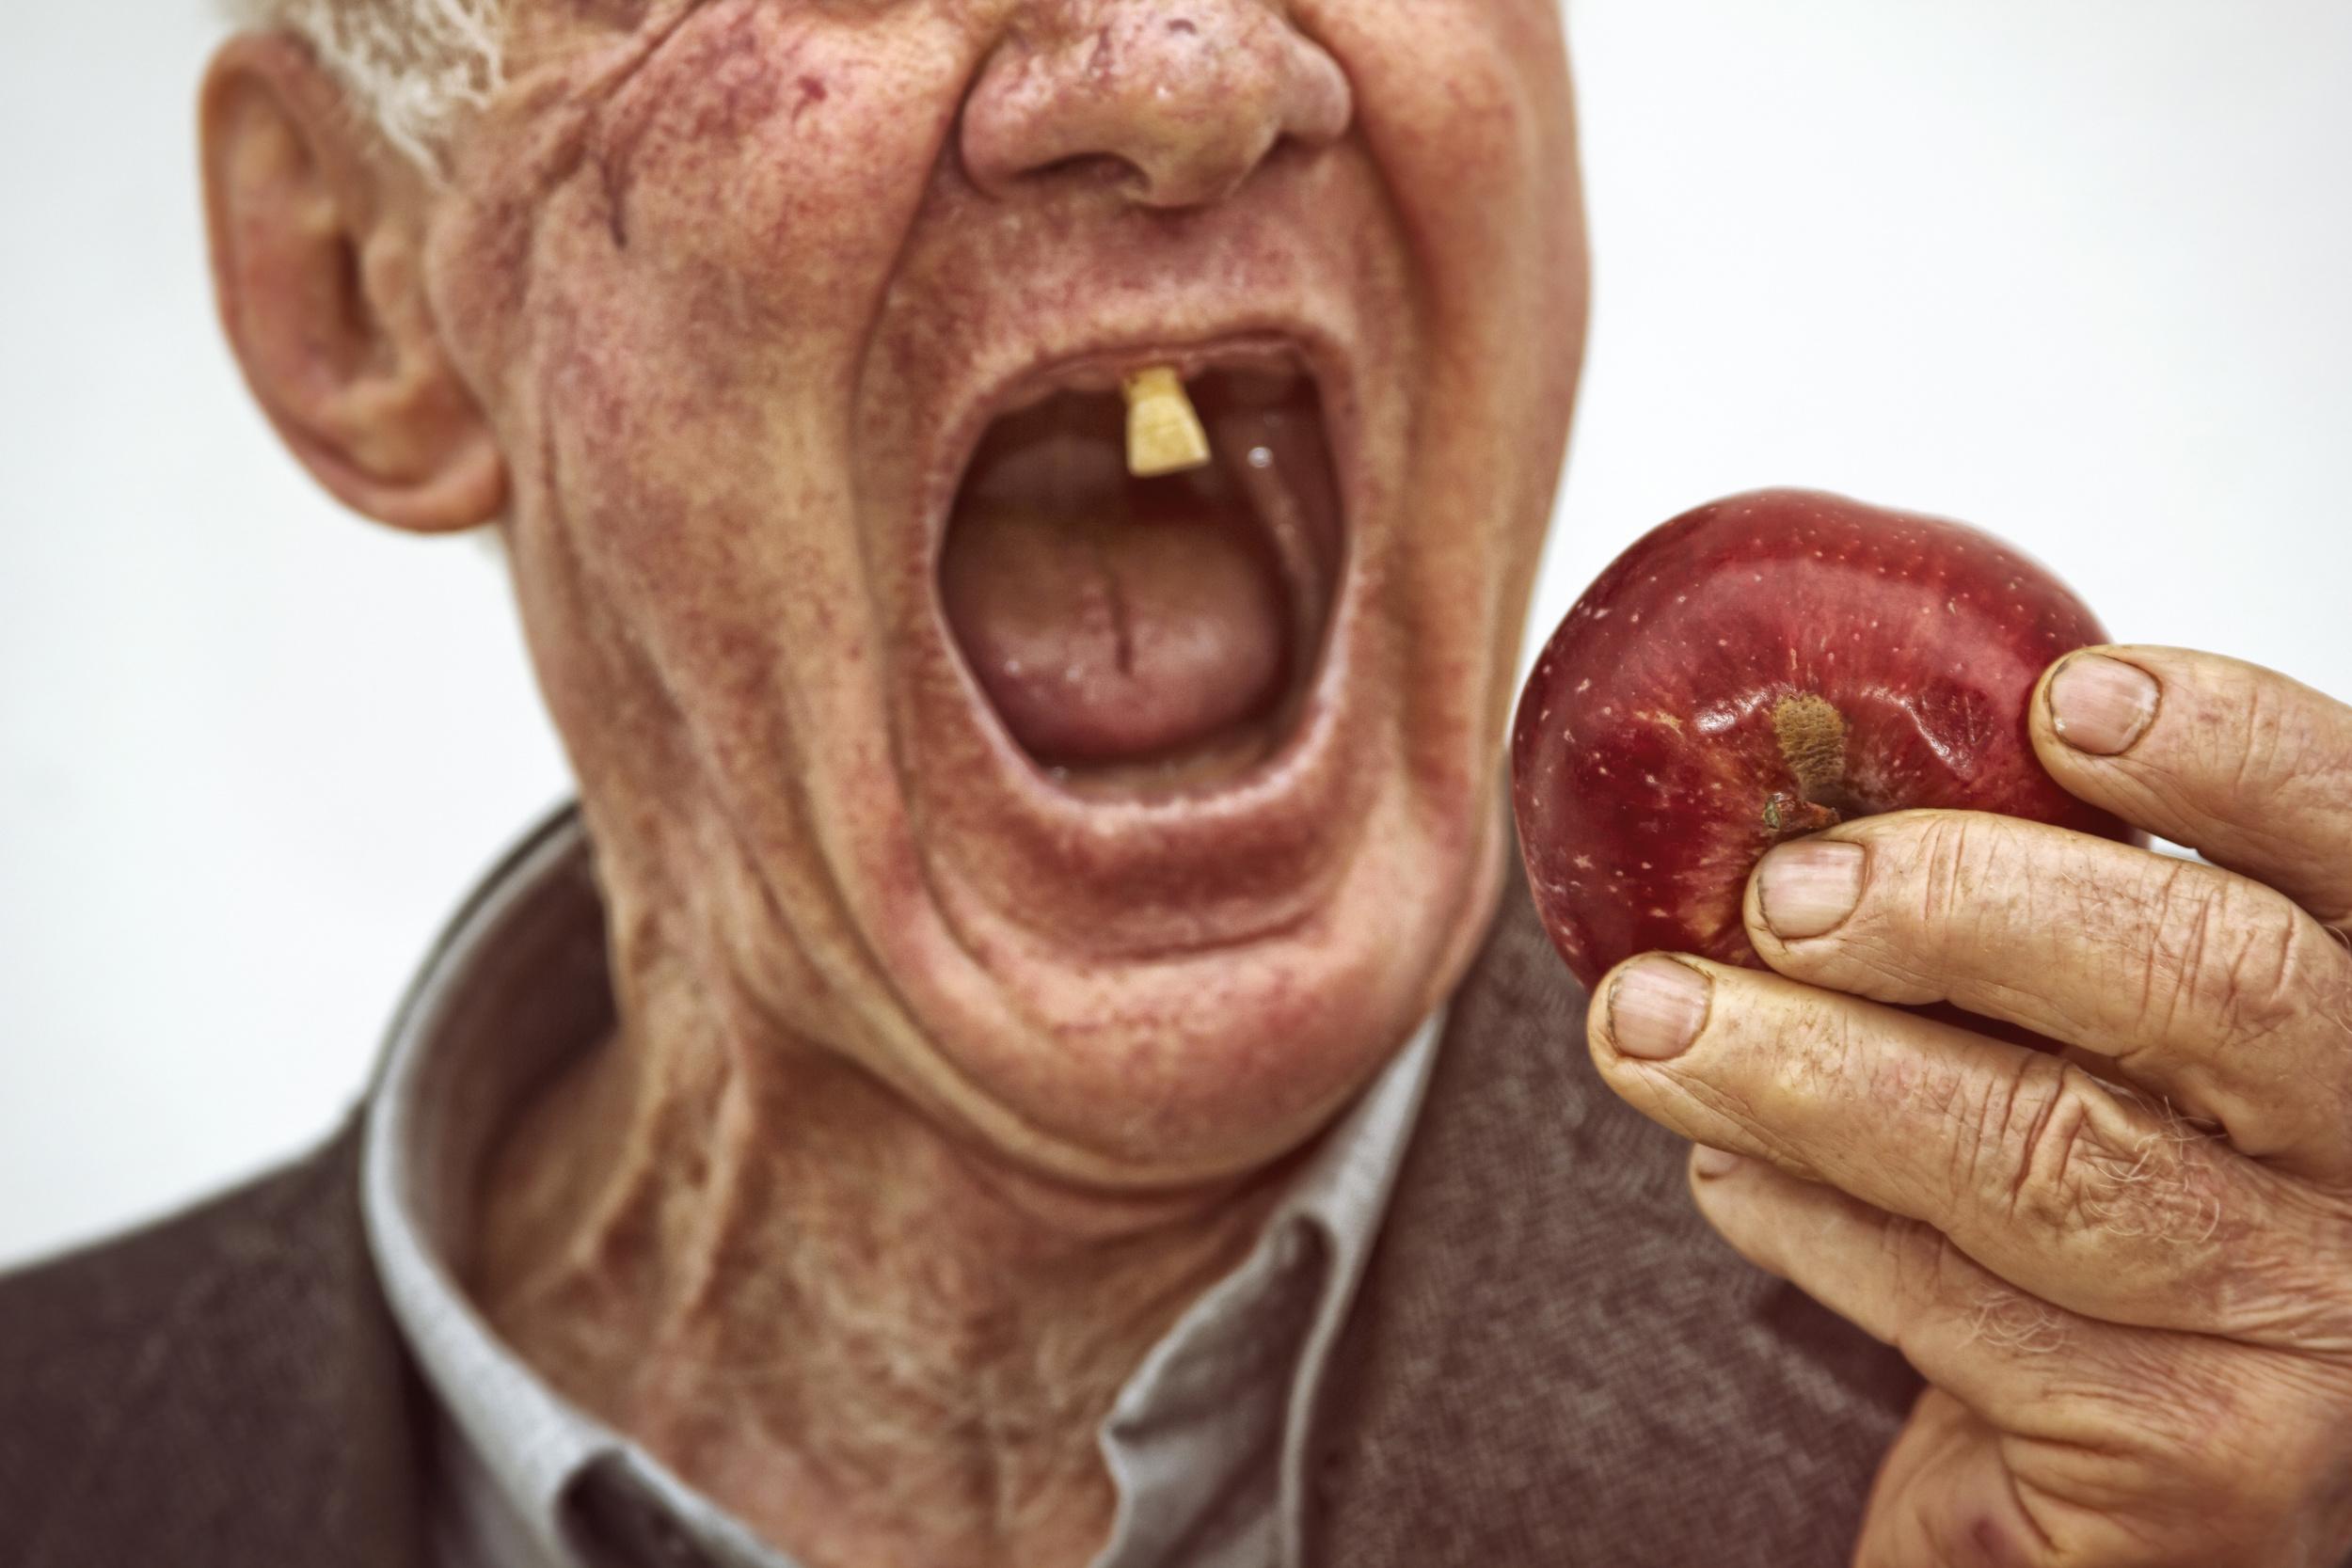 DenturesApple